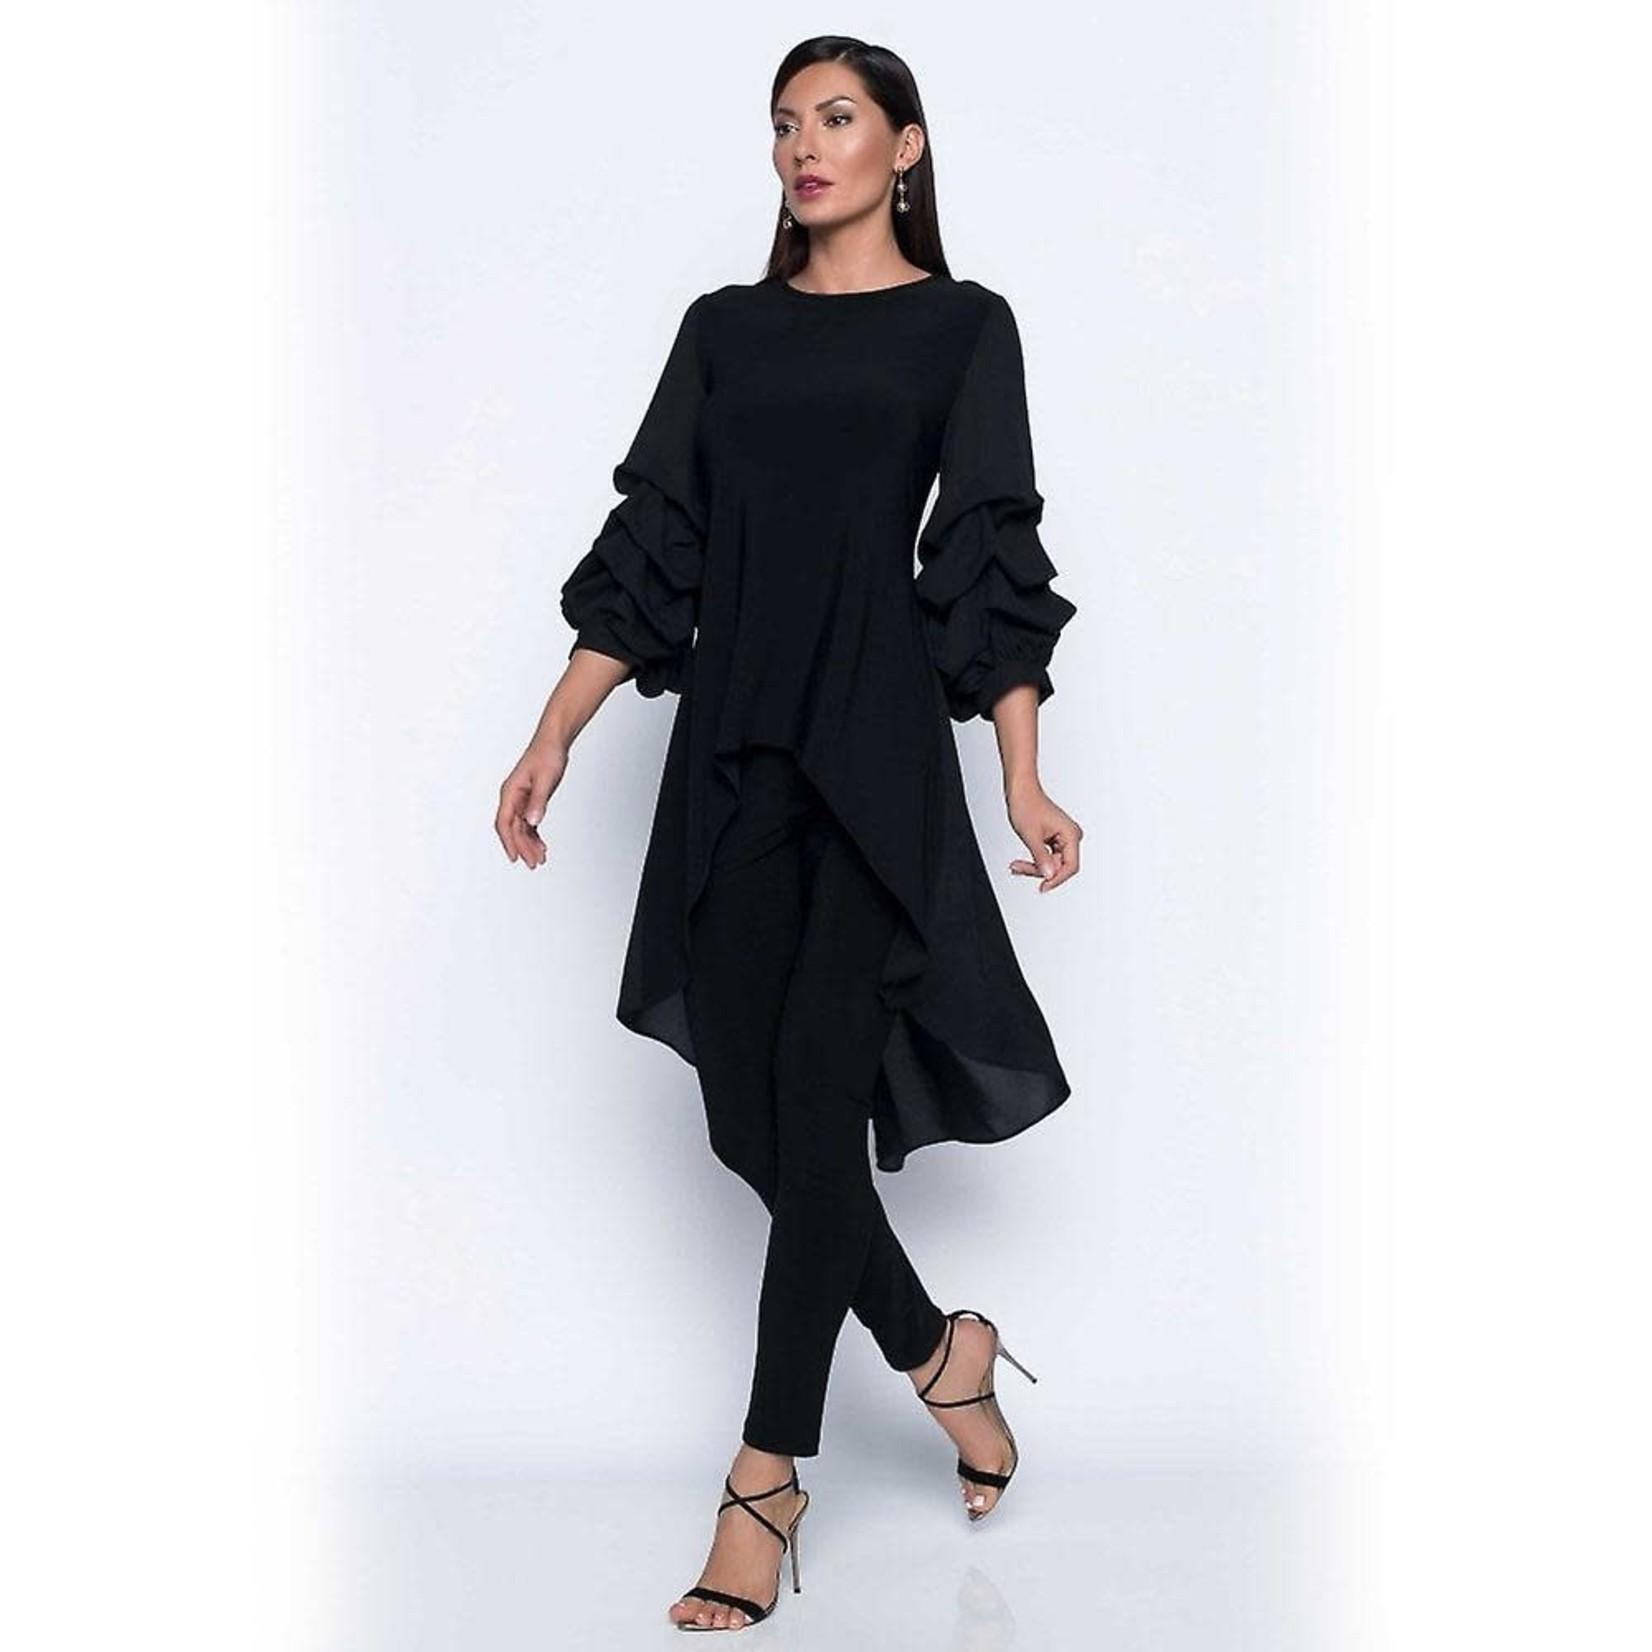 Voluminous Puffy Sleeve Black Fishtail Tunic